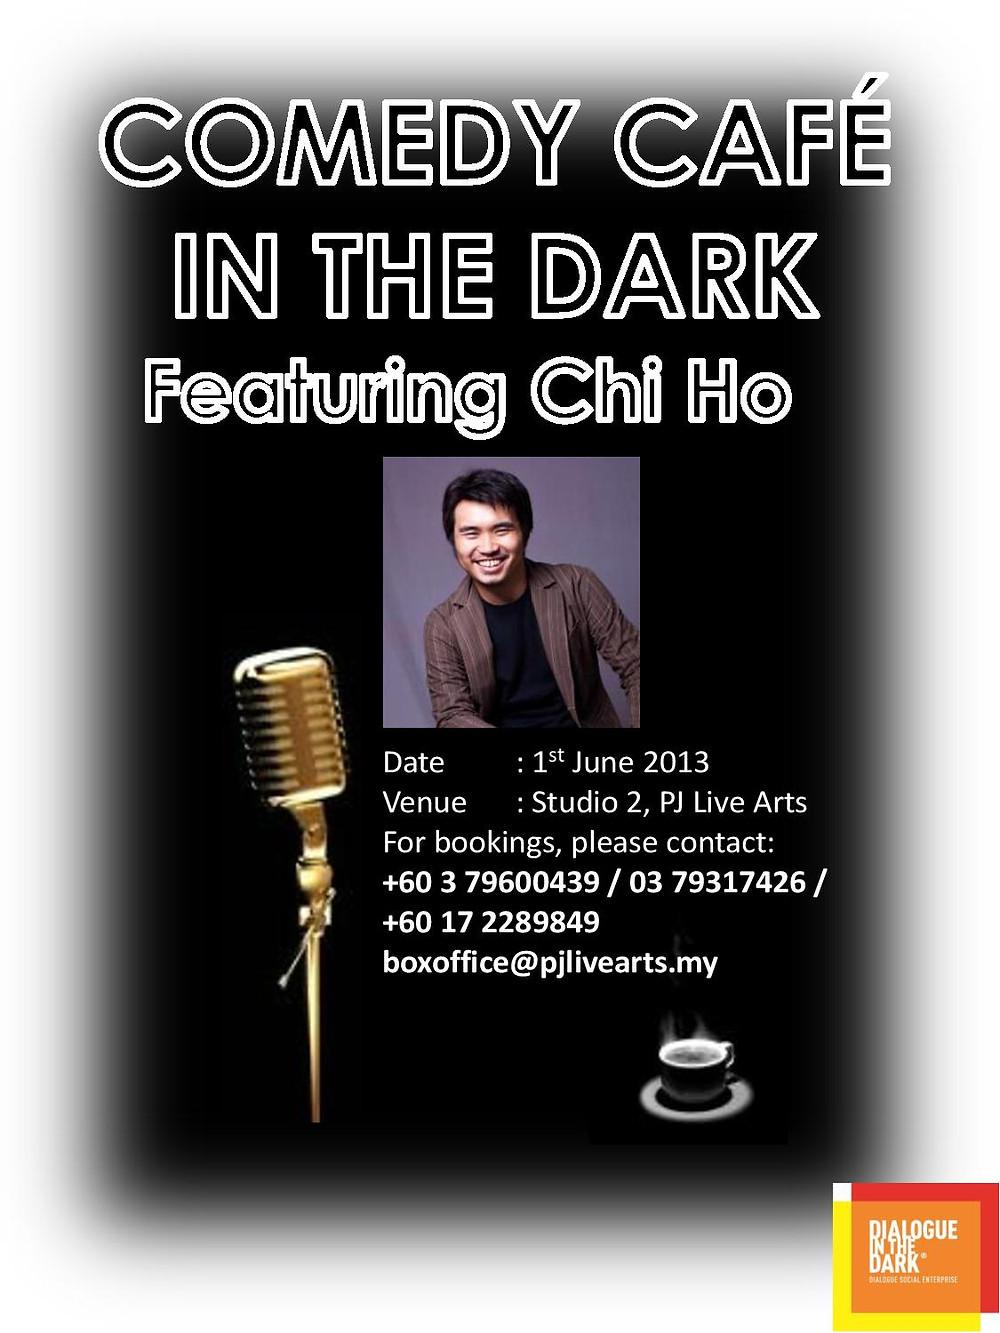 Featuring Chi Ho at Studio 2 PJ Live Arts